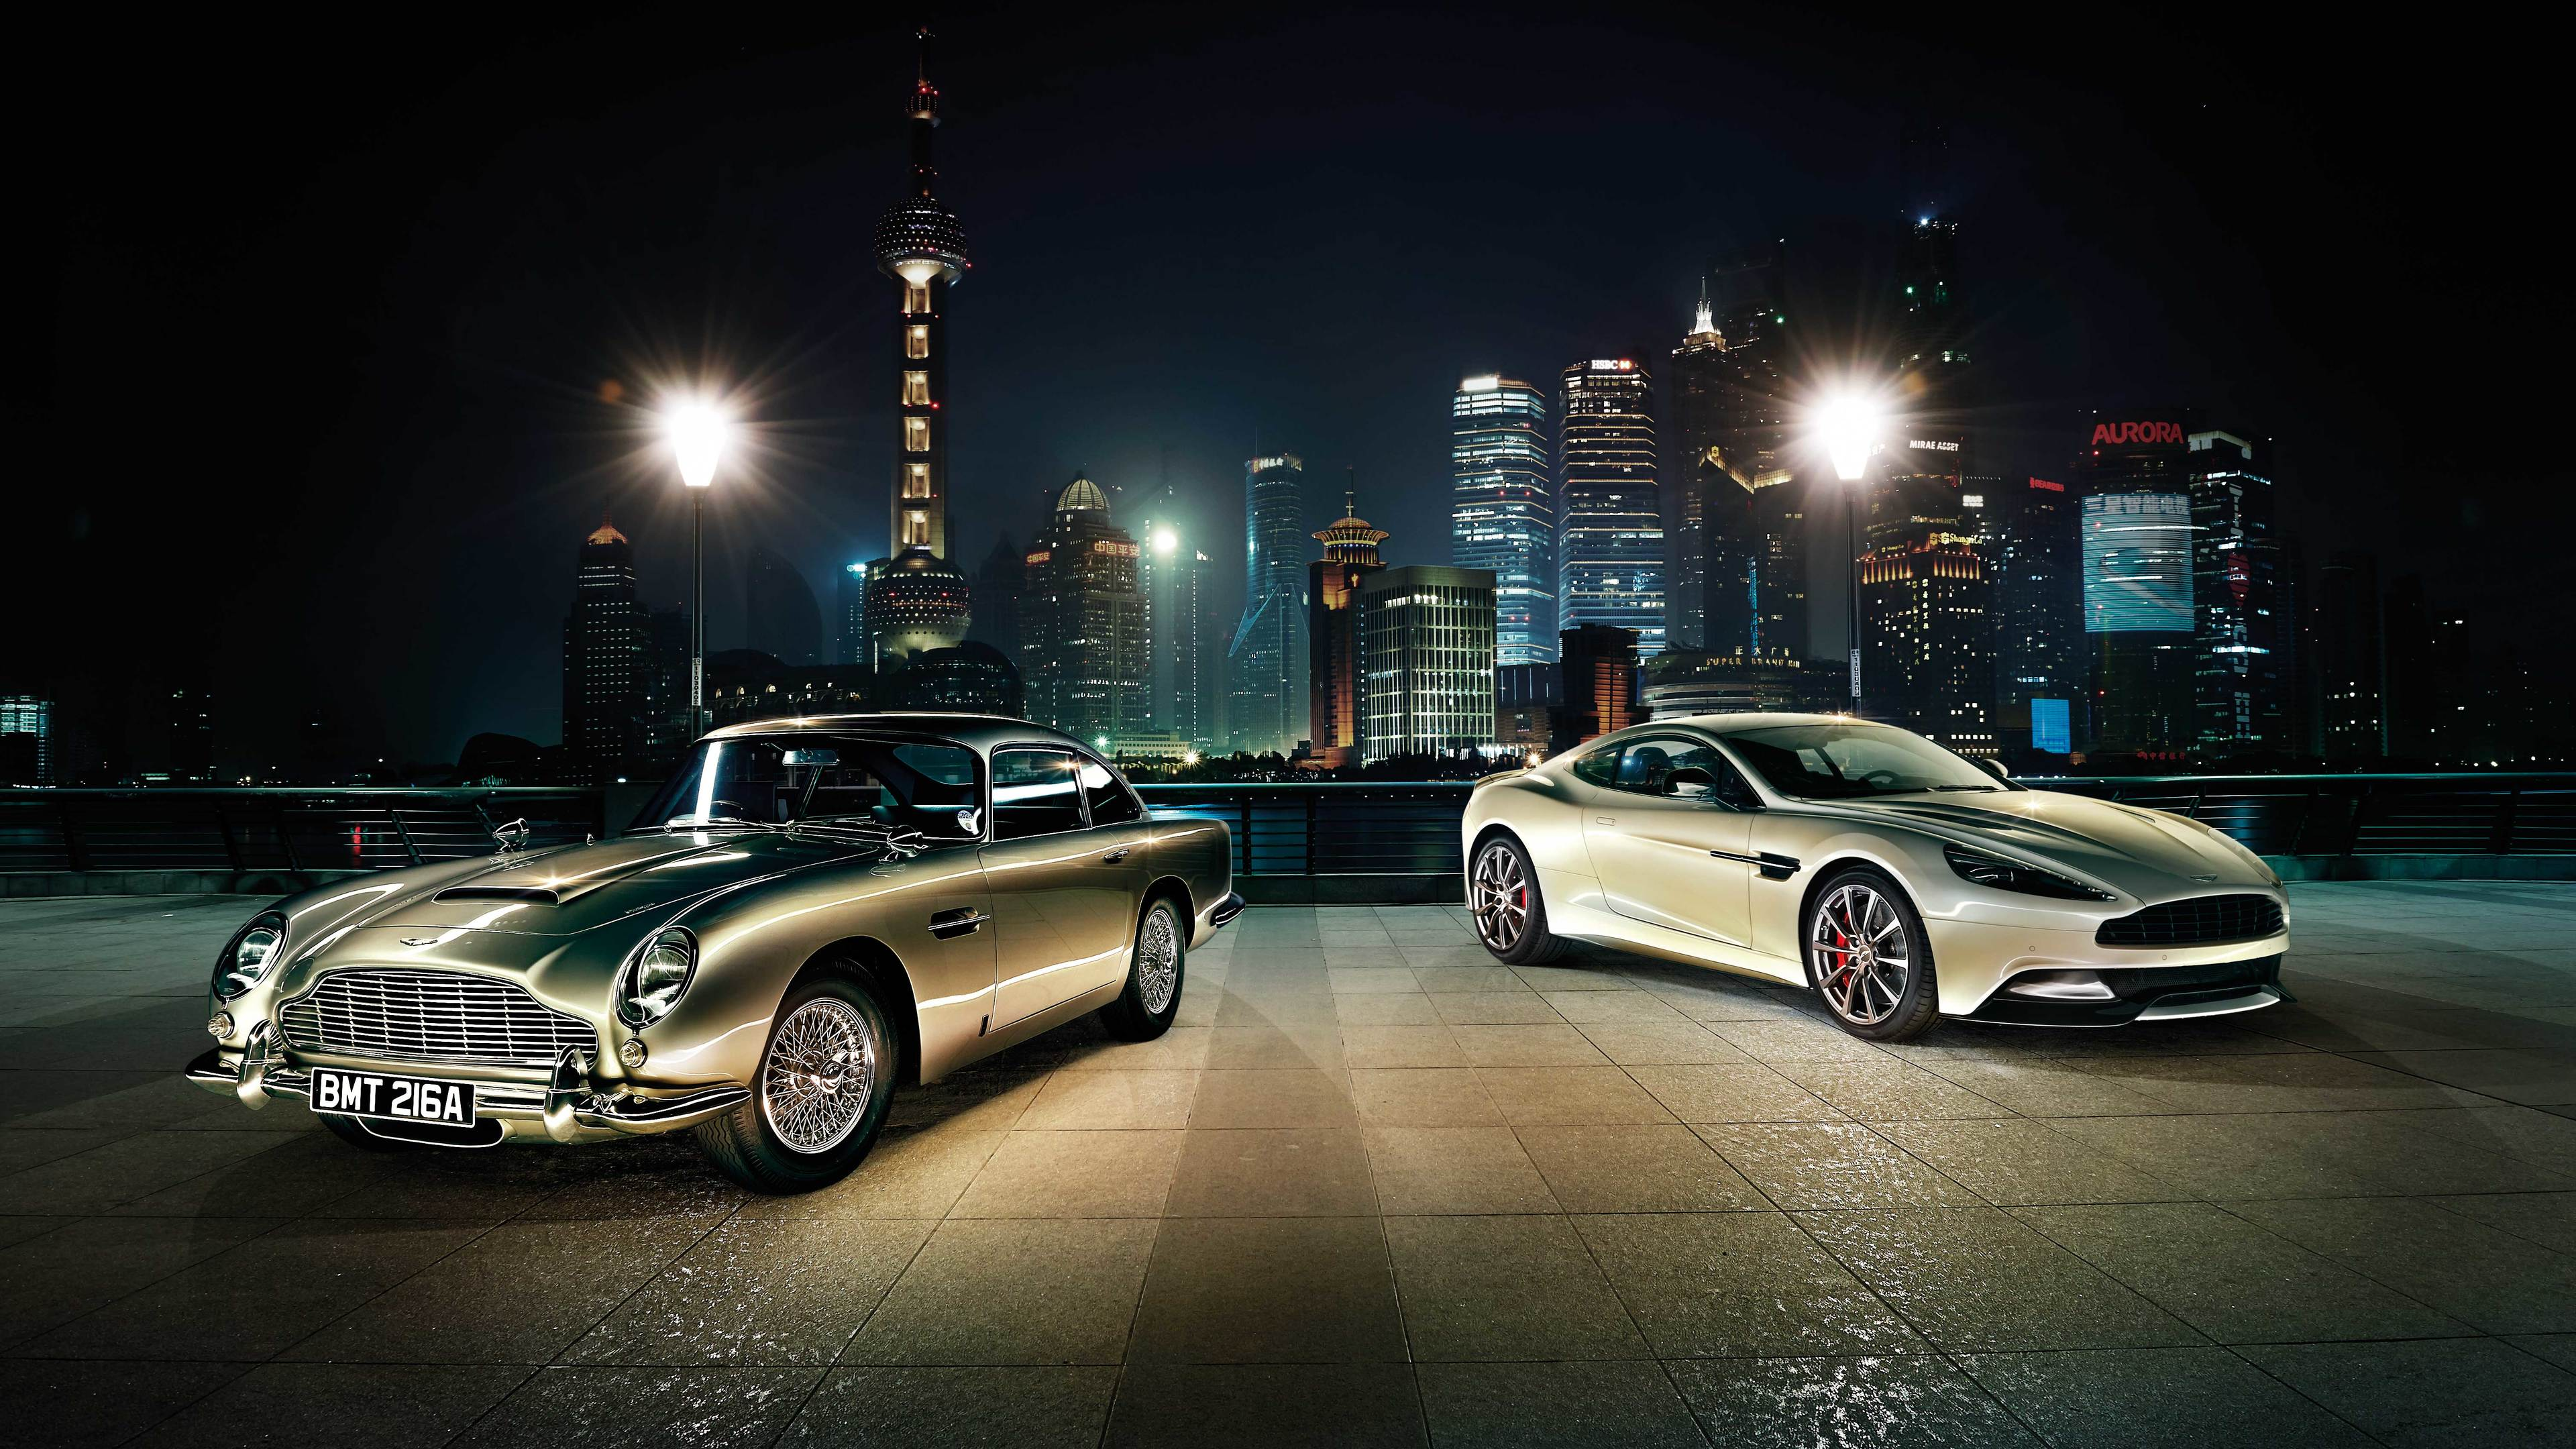 aston martin 4k 2019 1556185321 - Aston Martin 4k 2019 - hd-wallpapers, cars wallpapers, aston martin wallpapers, 5k wallpapers, 4k-wallpapers